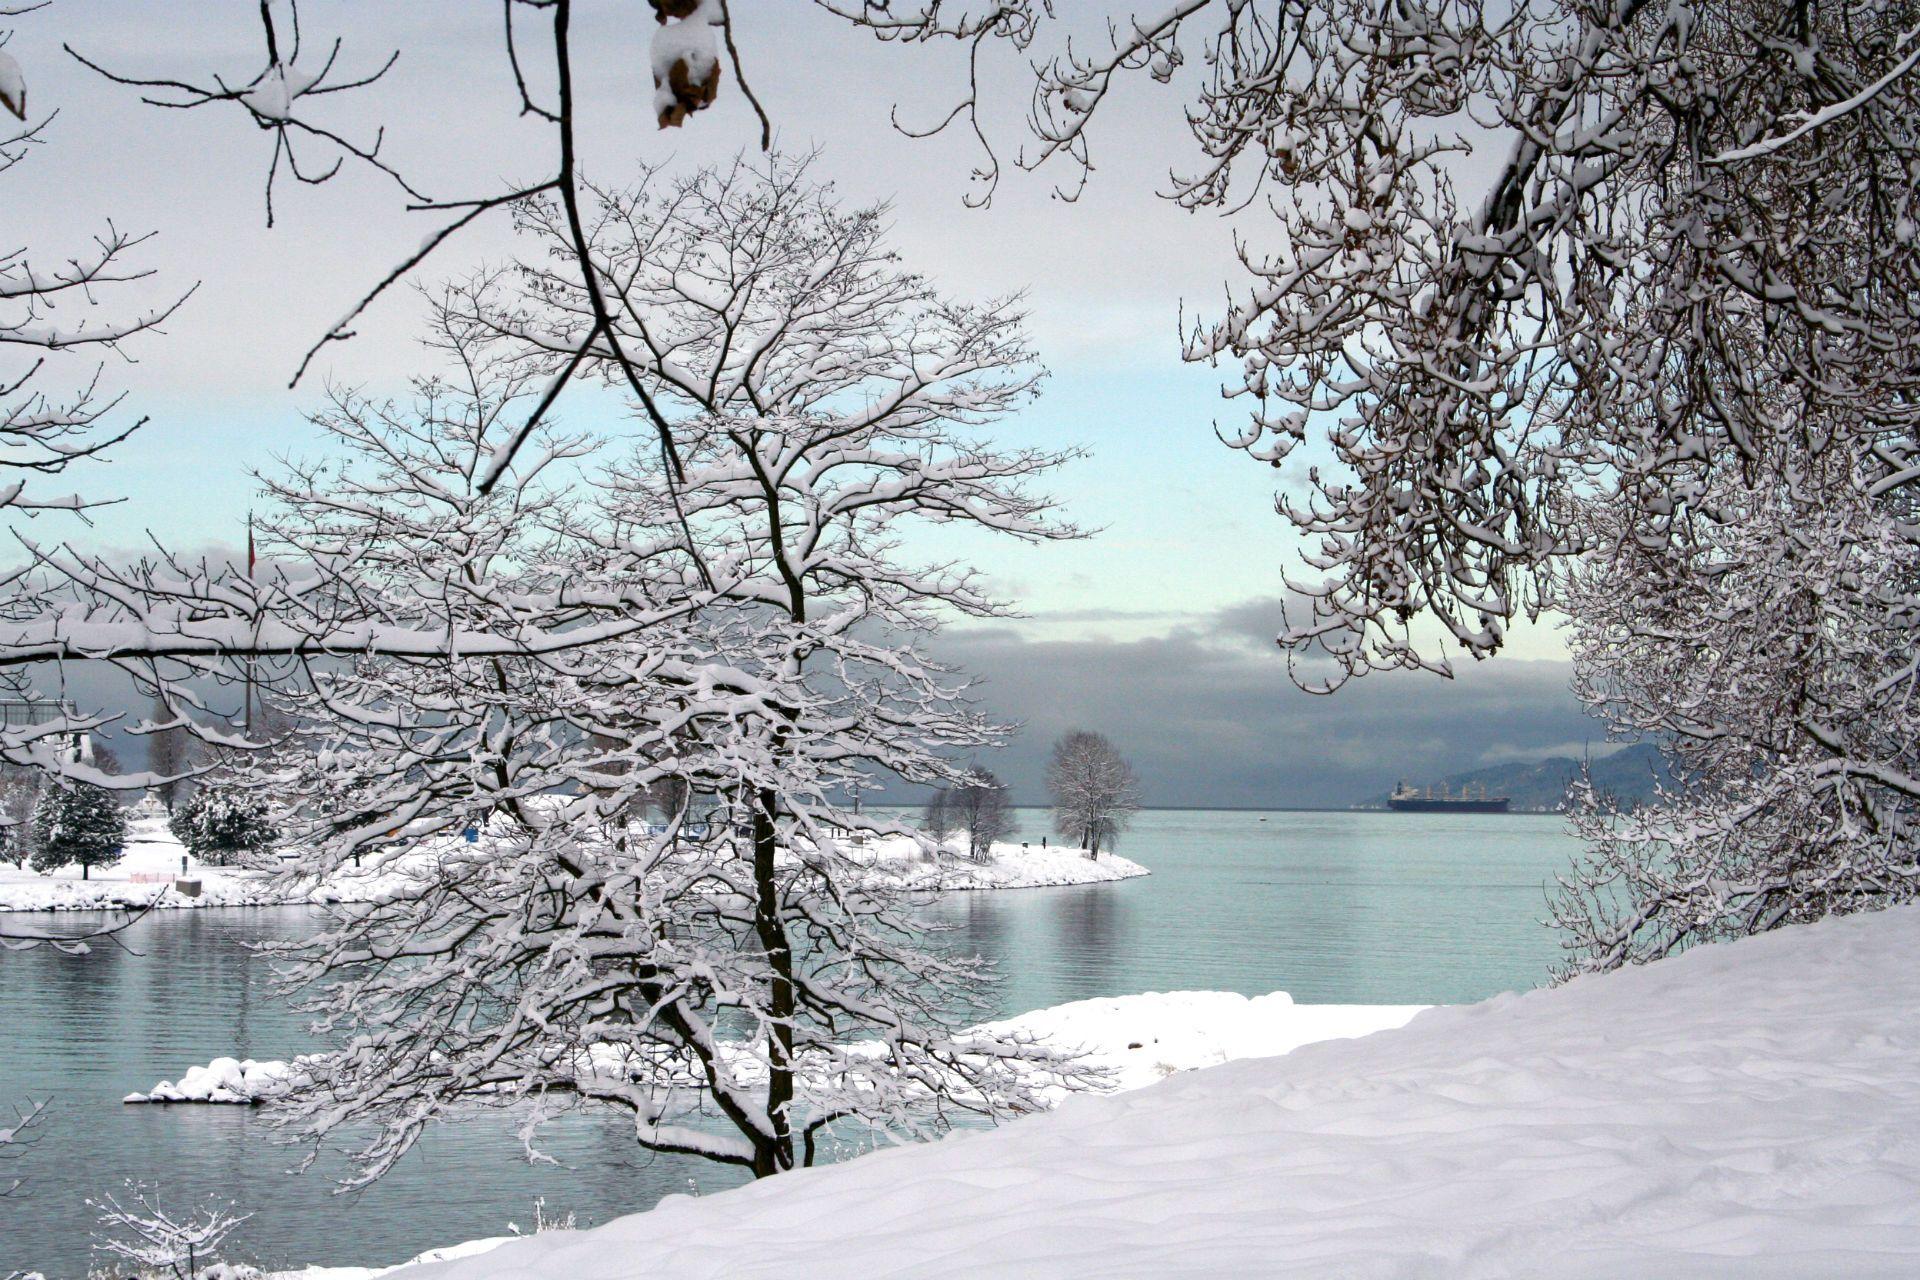 snowy winter scenes - Google Search | Winter Pictures ...